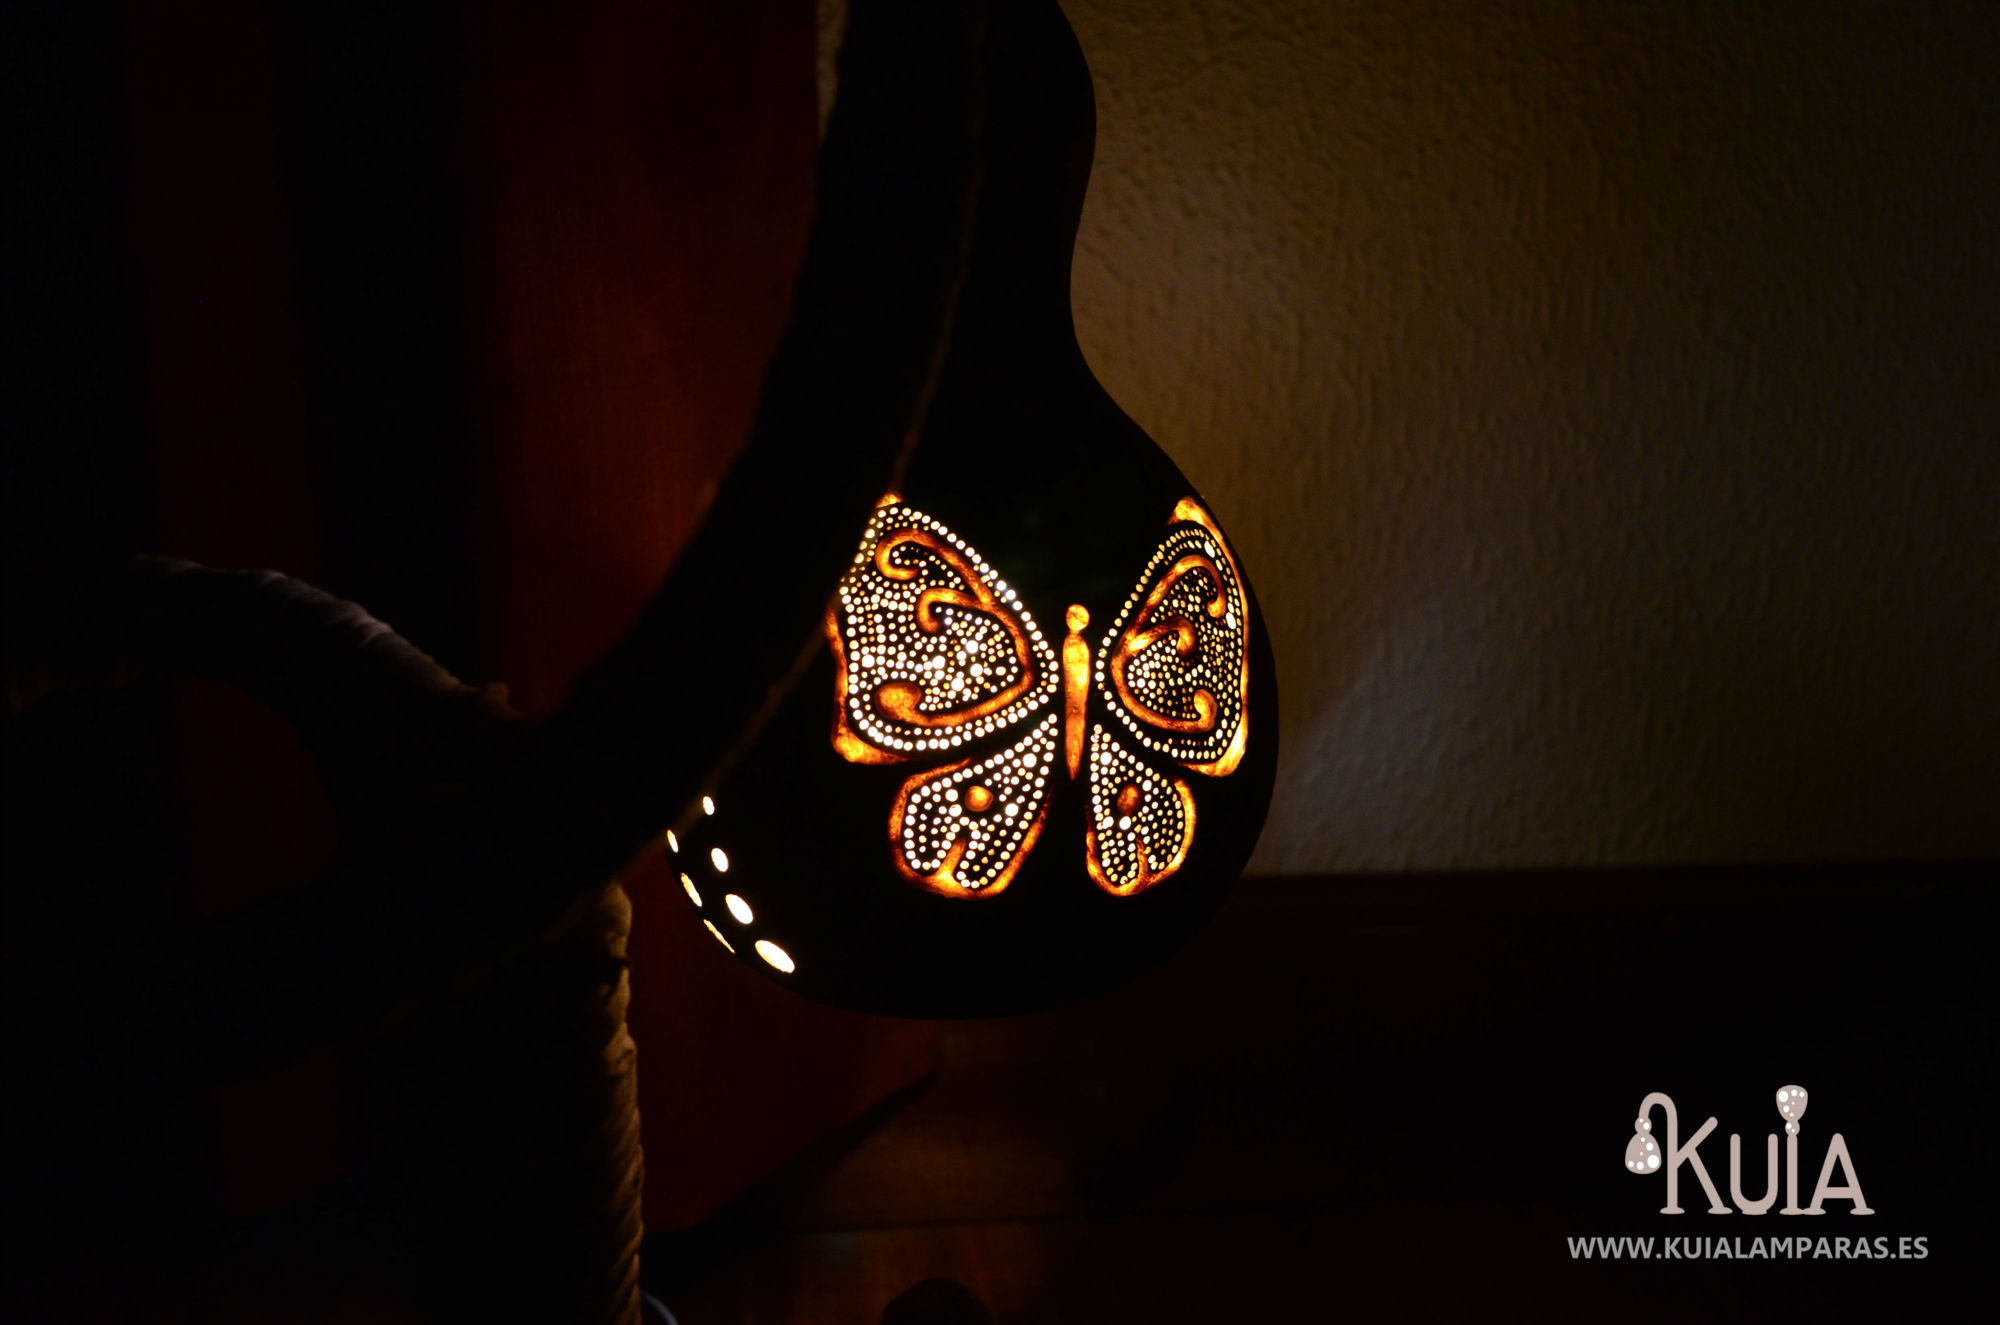 lampara de decoracion de interiores pinpilinpauxa